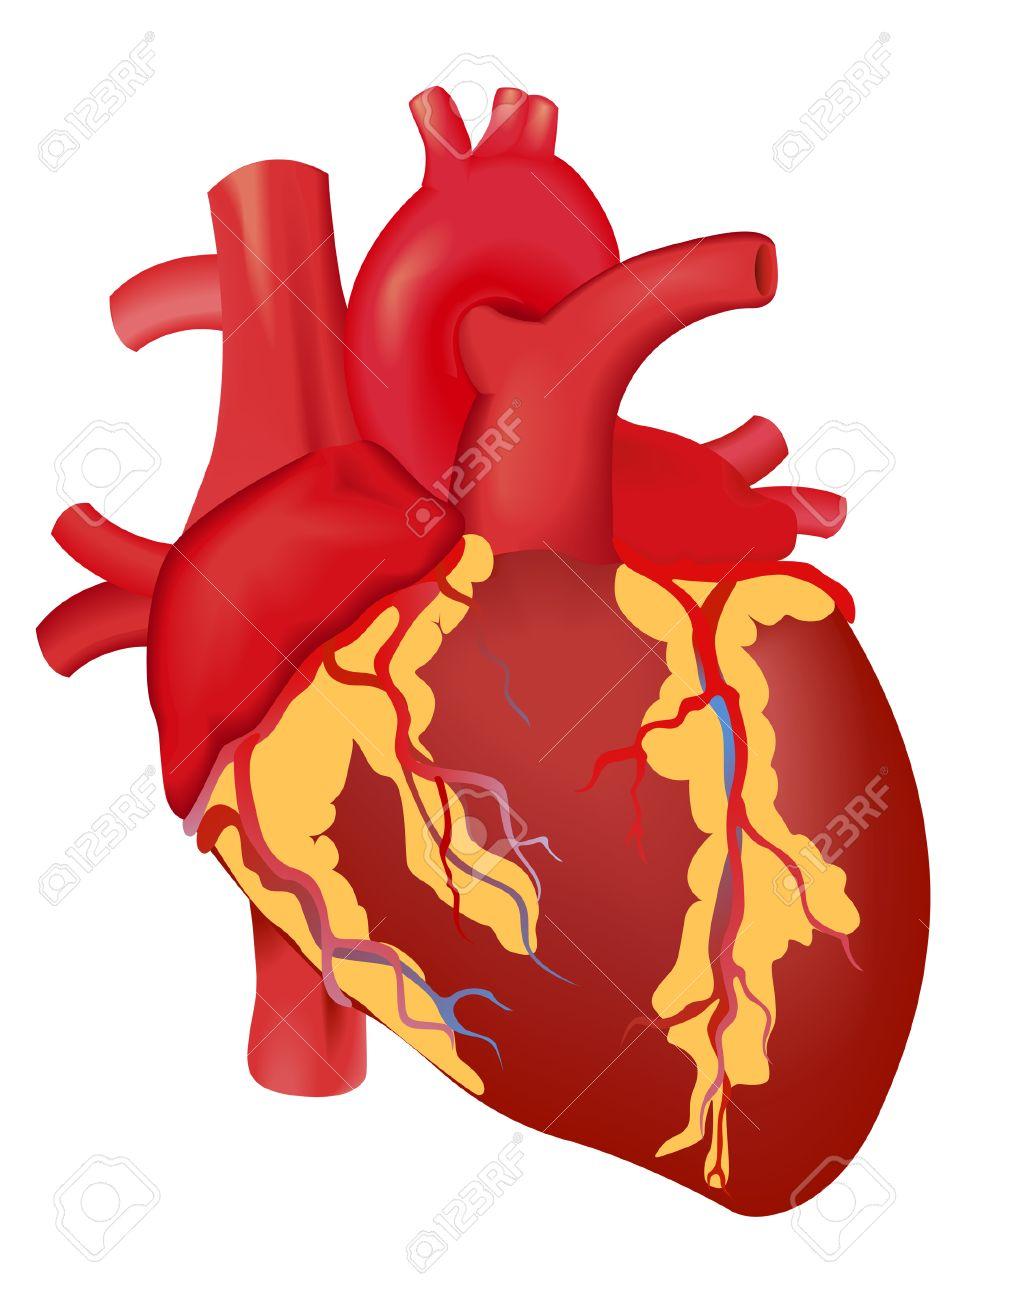 Human Heart Vector Image Human Heart Human Heart With